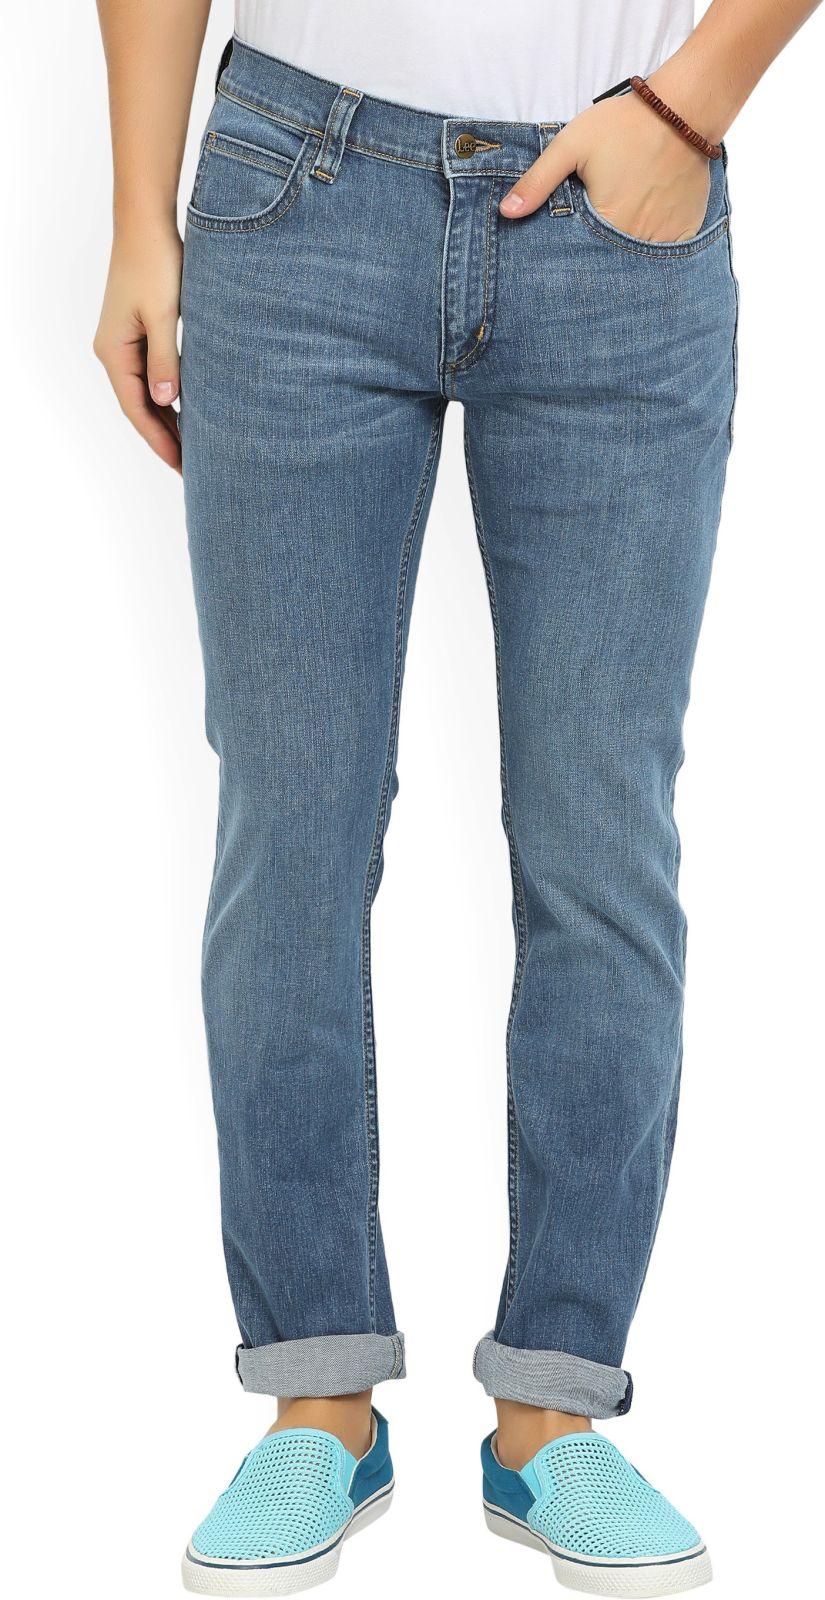 Lee Skinny Men's Blue Jeans